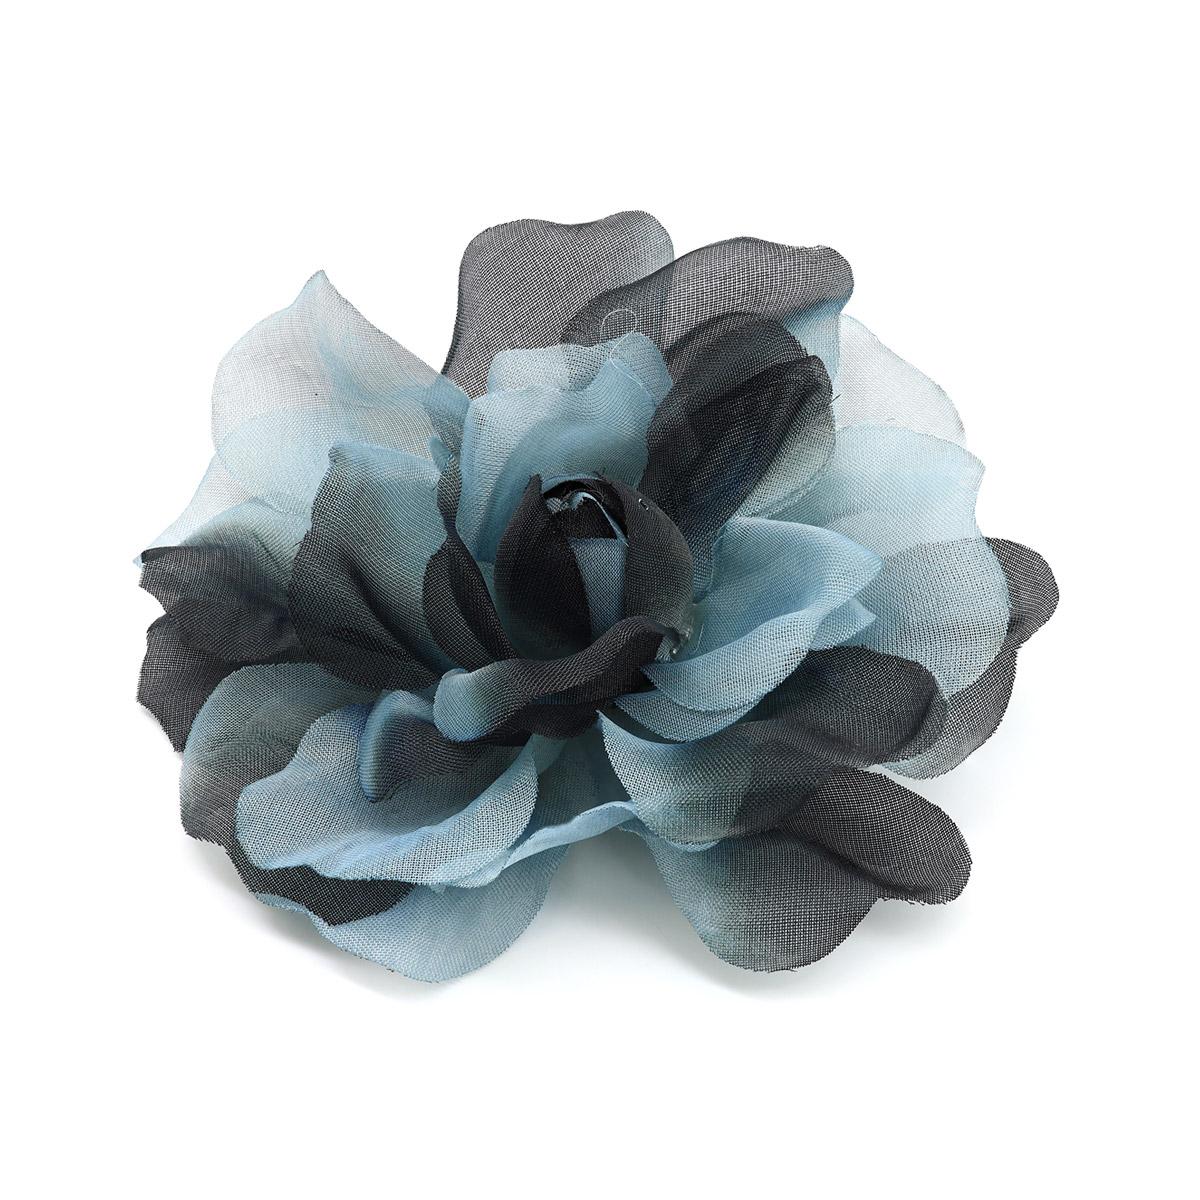 2038-6108 Брошь-цветок, 13 см, упак./12 шт.